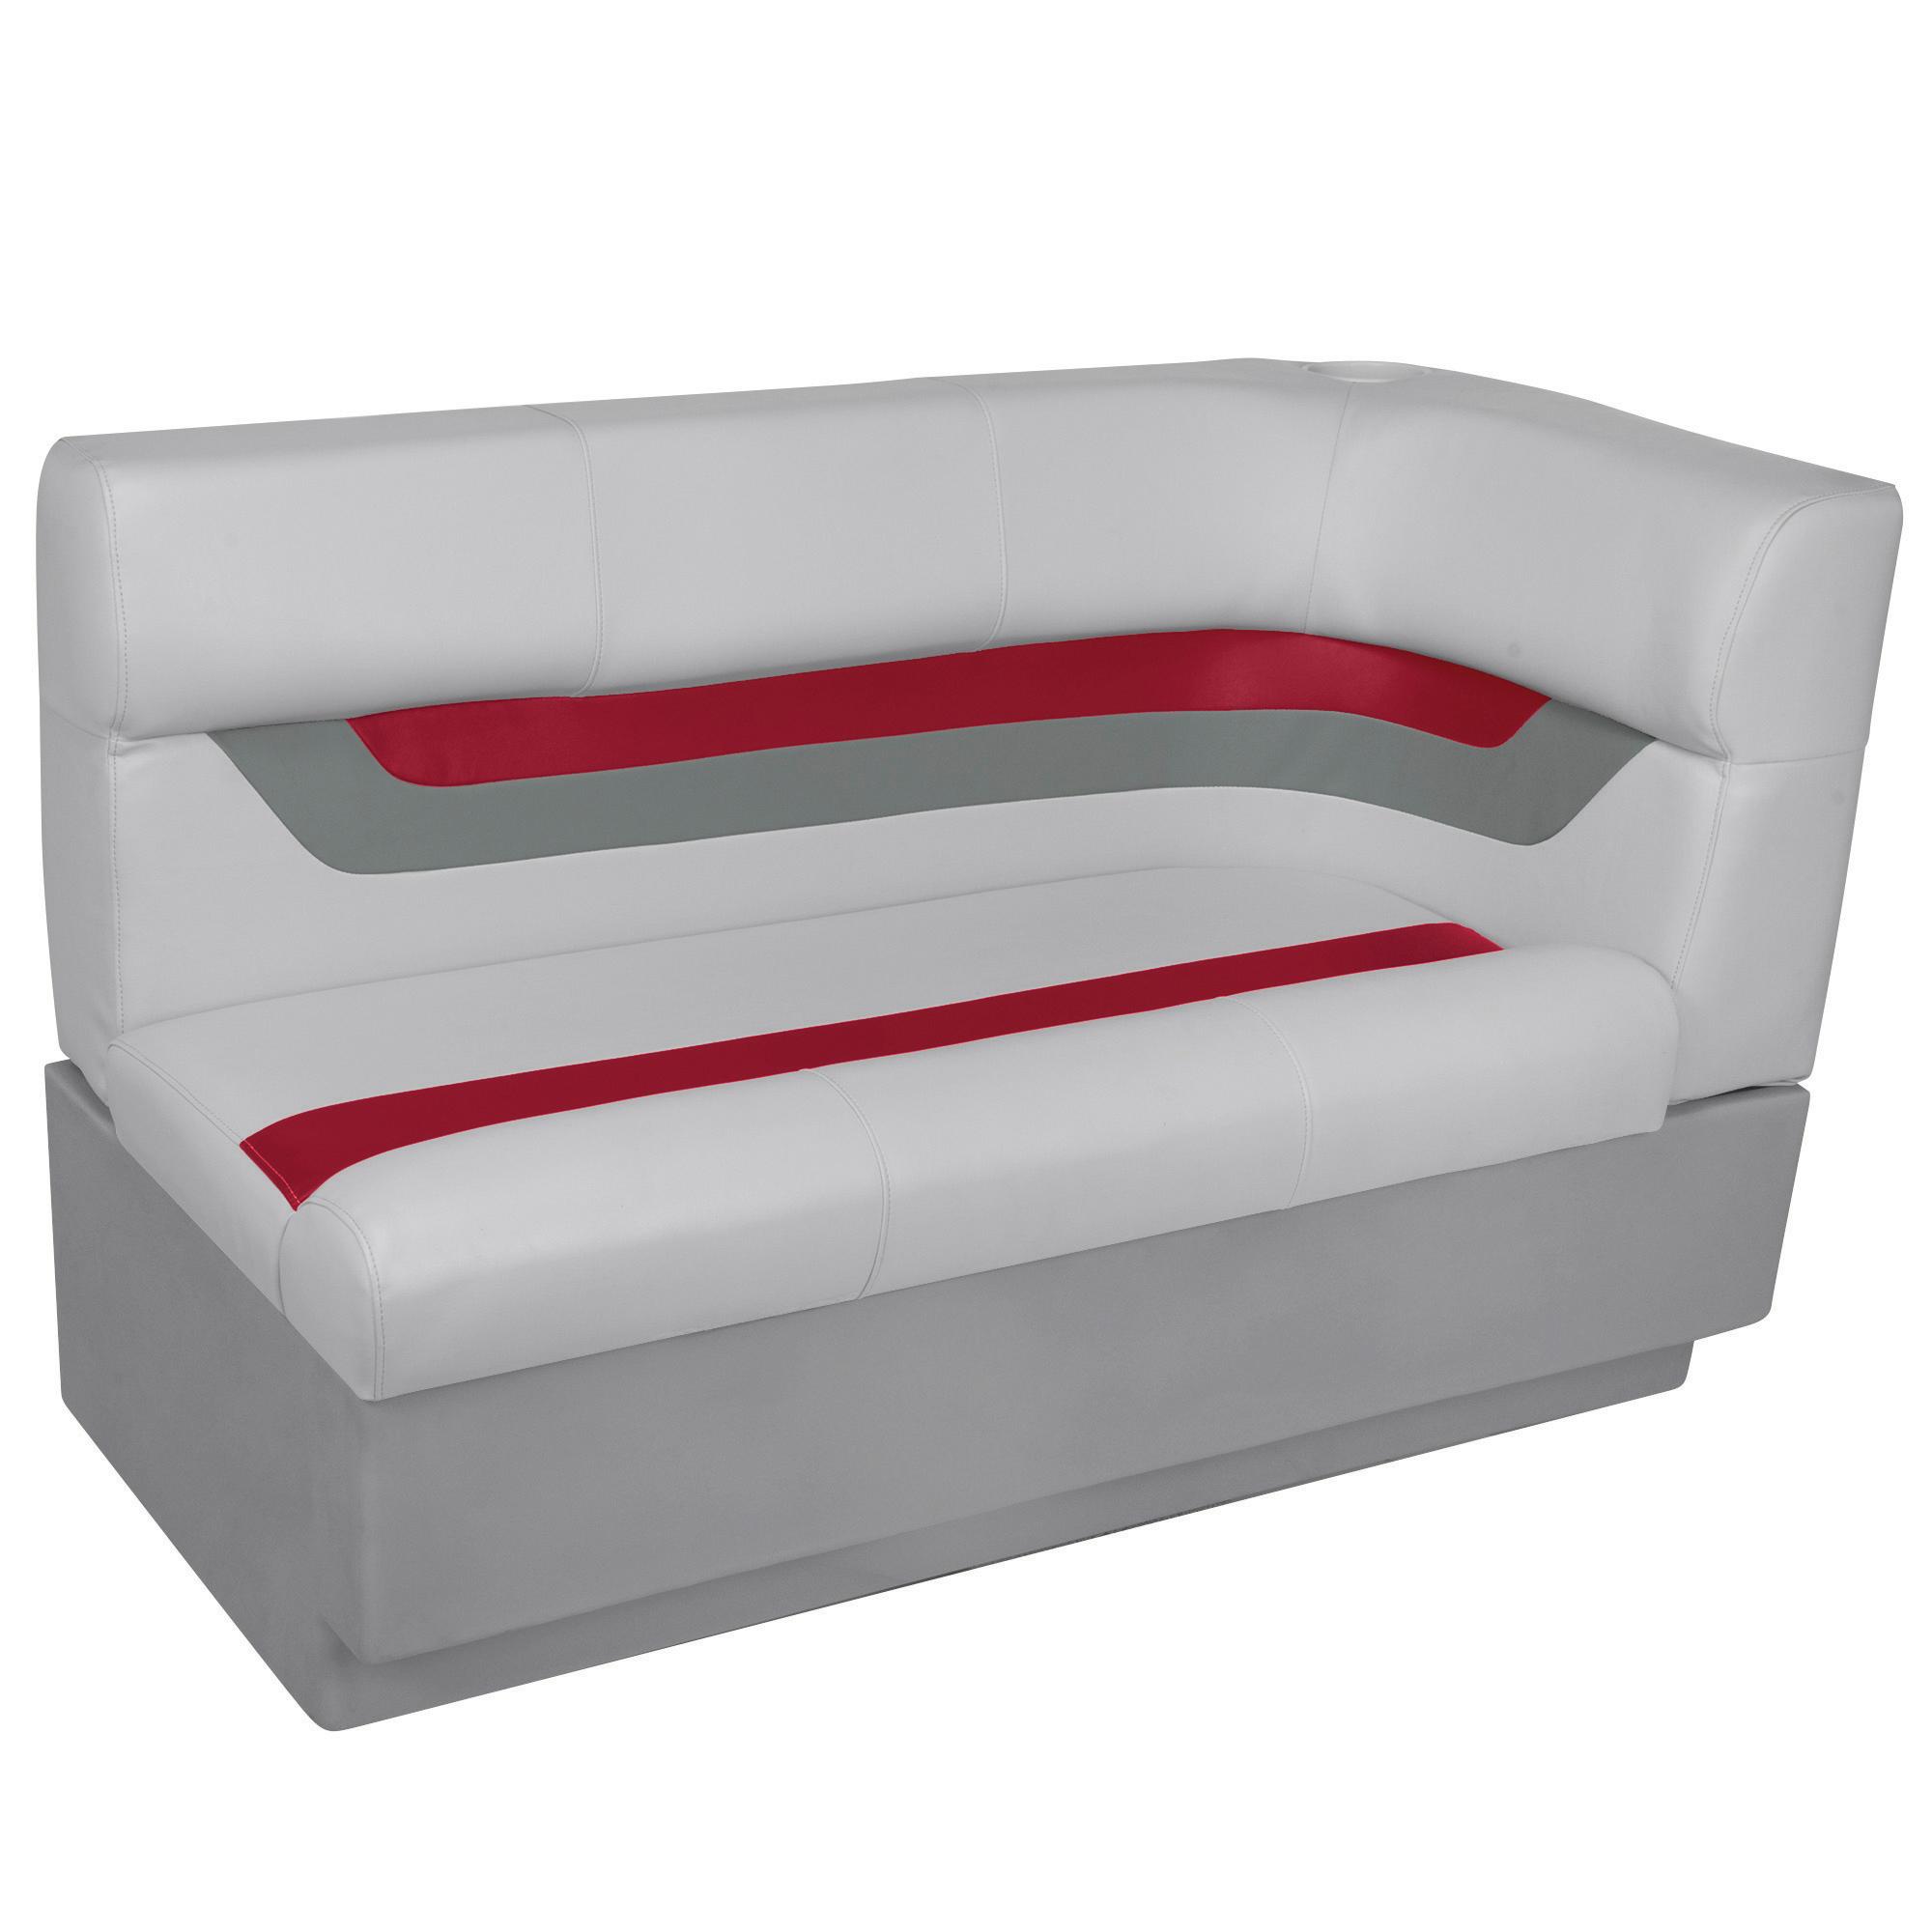 Toonmate Designer Pontoon Left-Side Corner Couch - TOP ONLY - Sky Gray/Dark Red